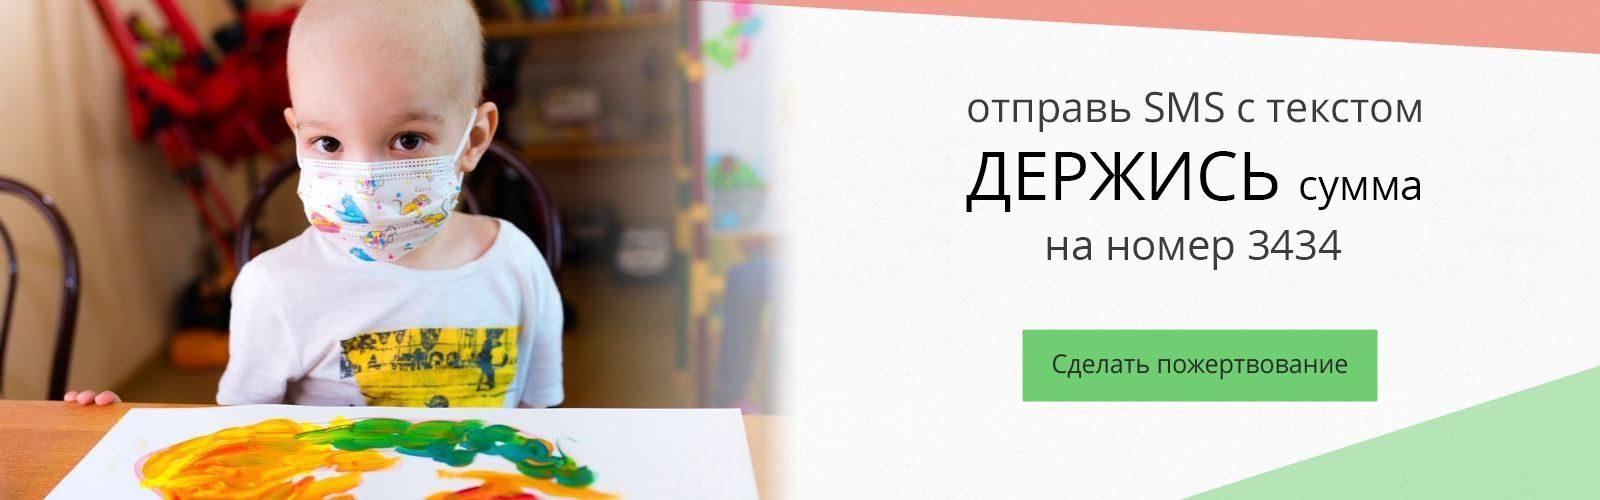 Баннер_SMS